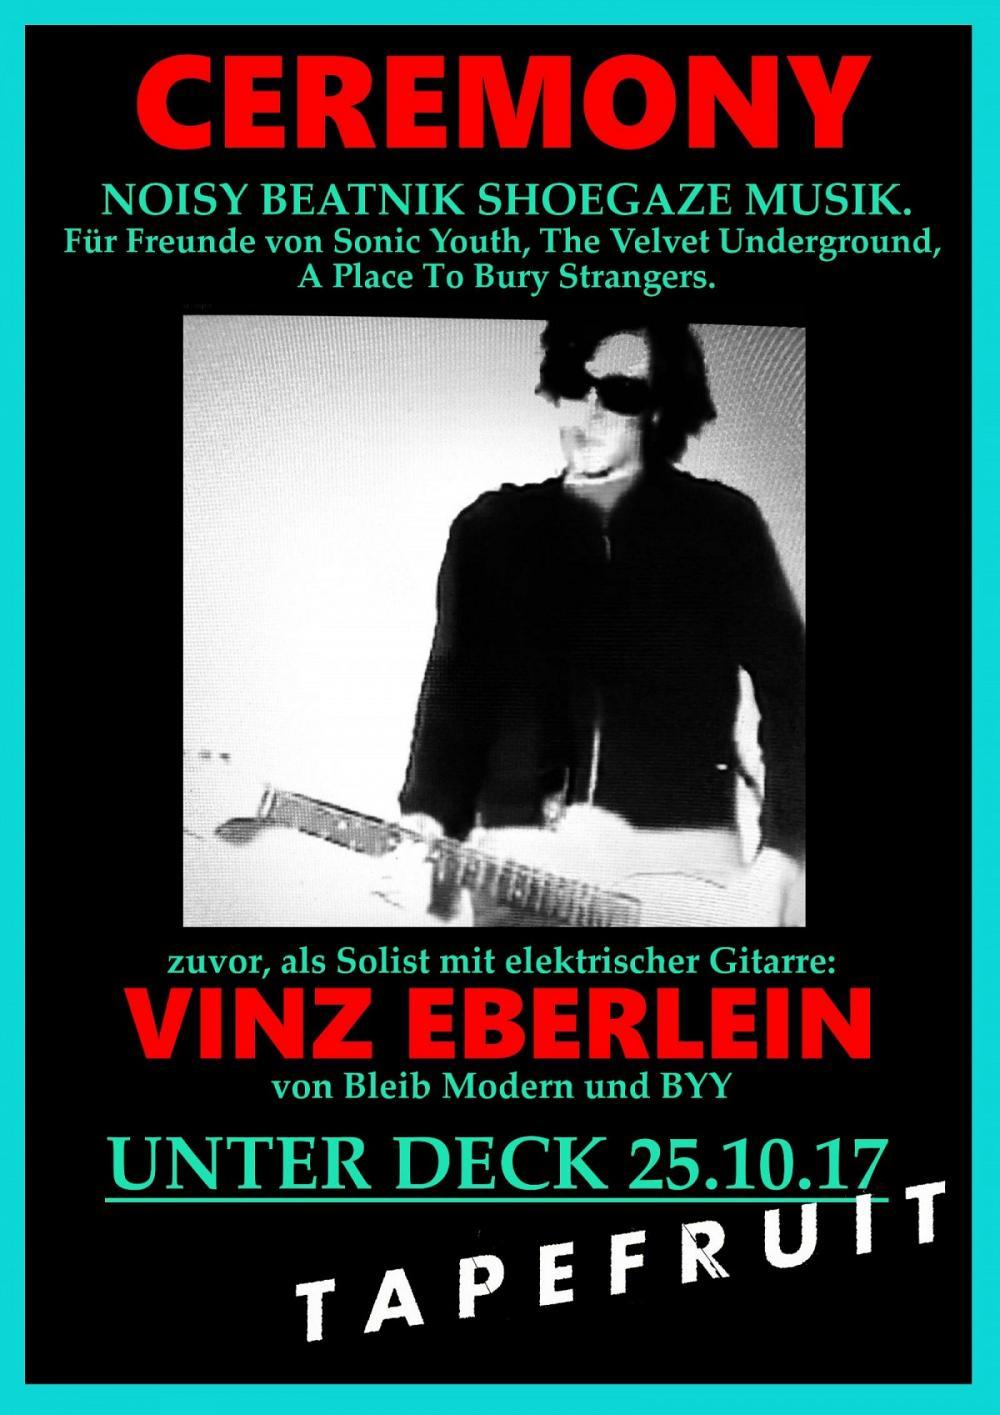 Tapefruit Konzert: Ceremony + Vinz Eberlein + Alex Kelman | 25.10.2017 @ Unter Deck